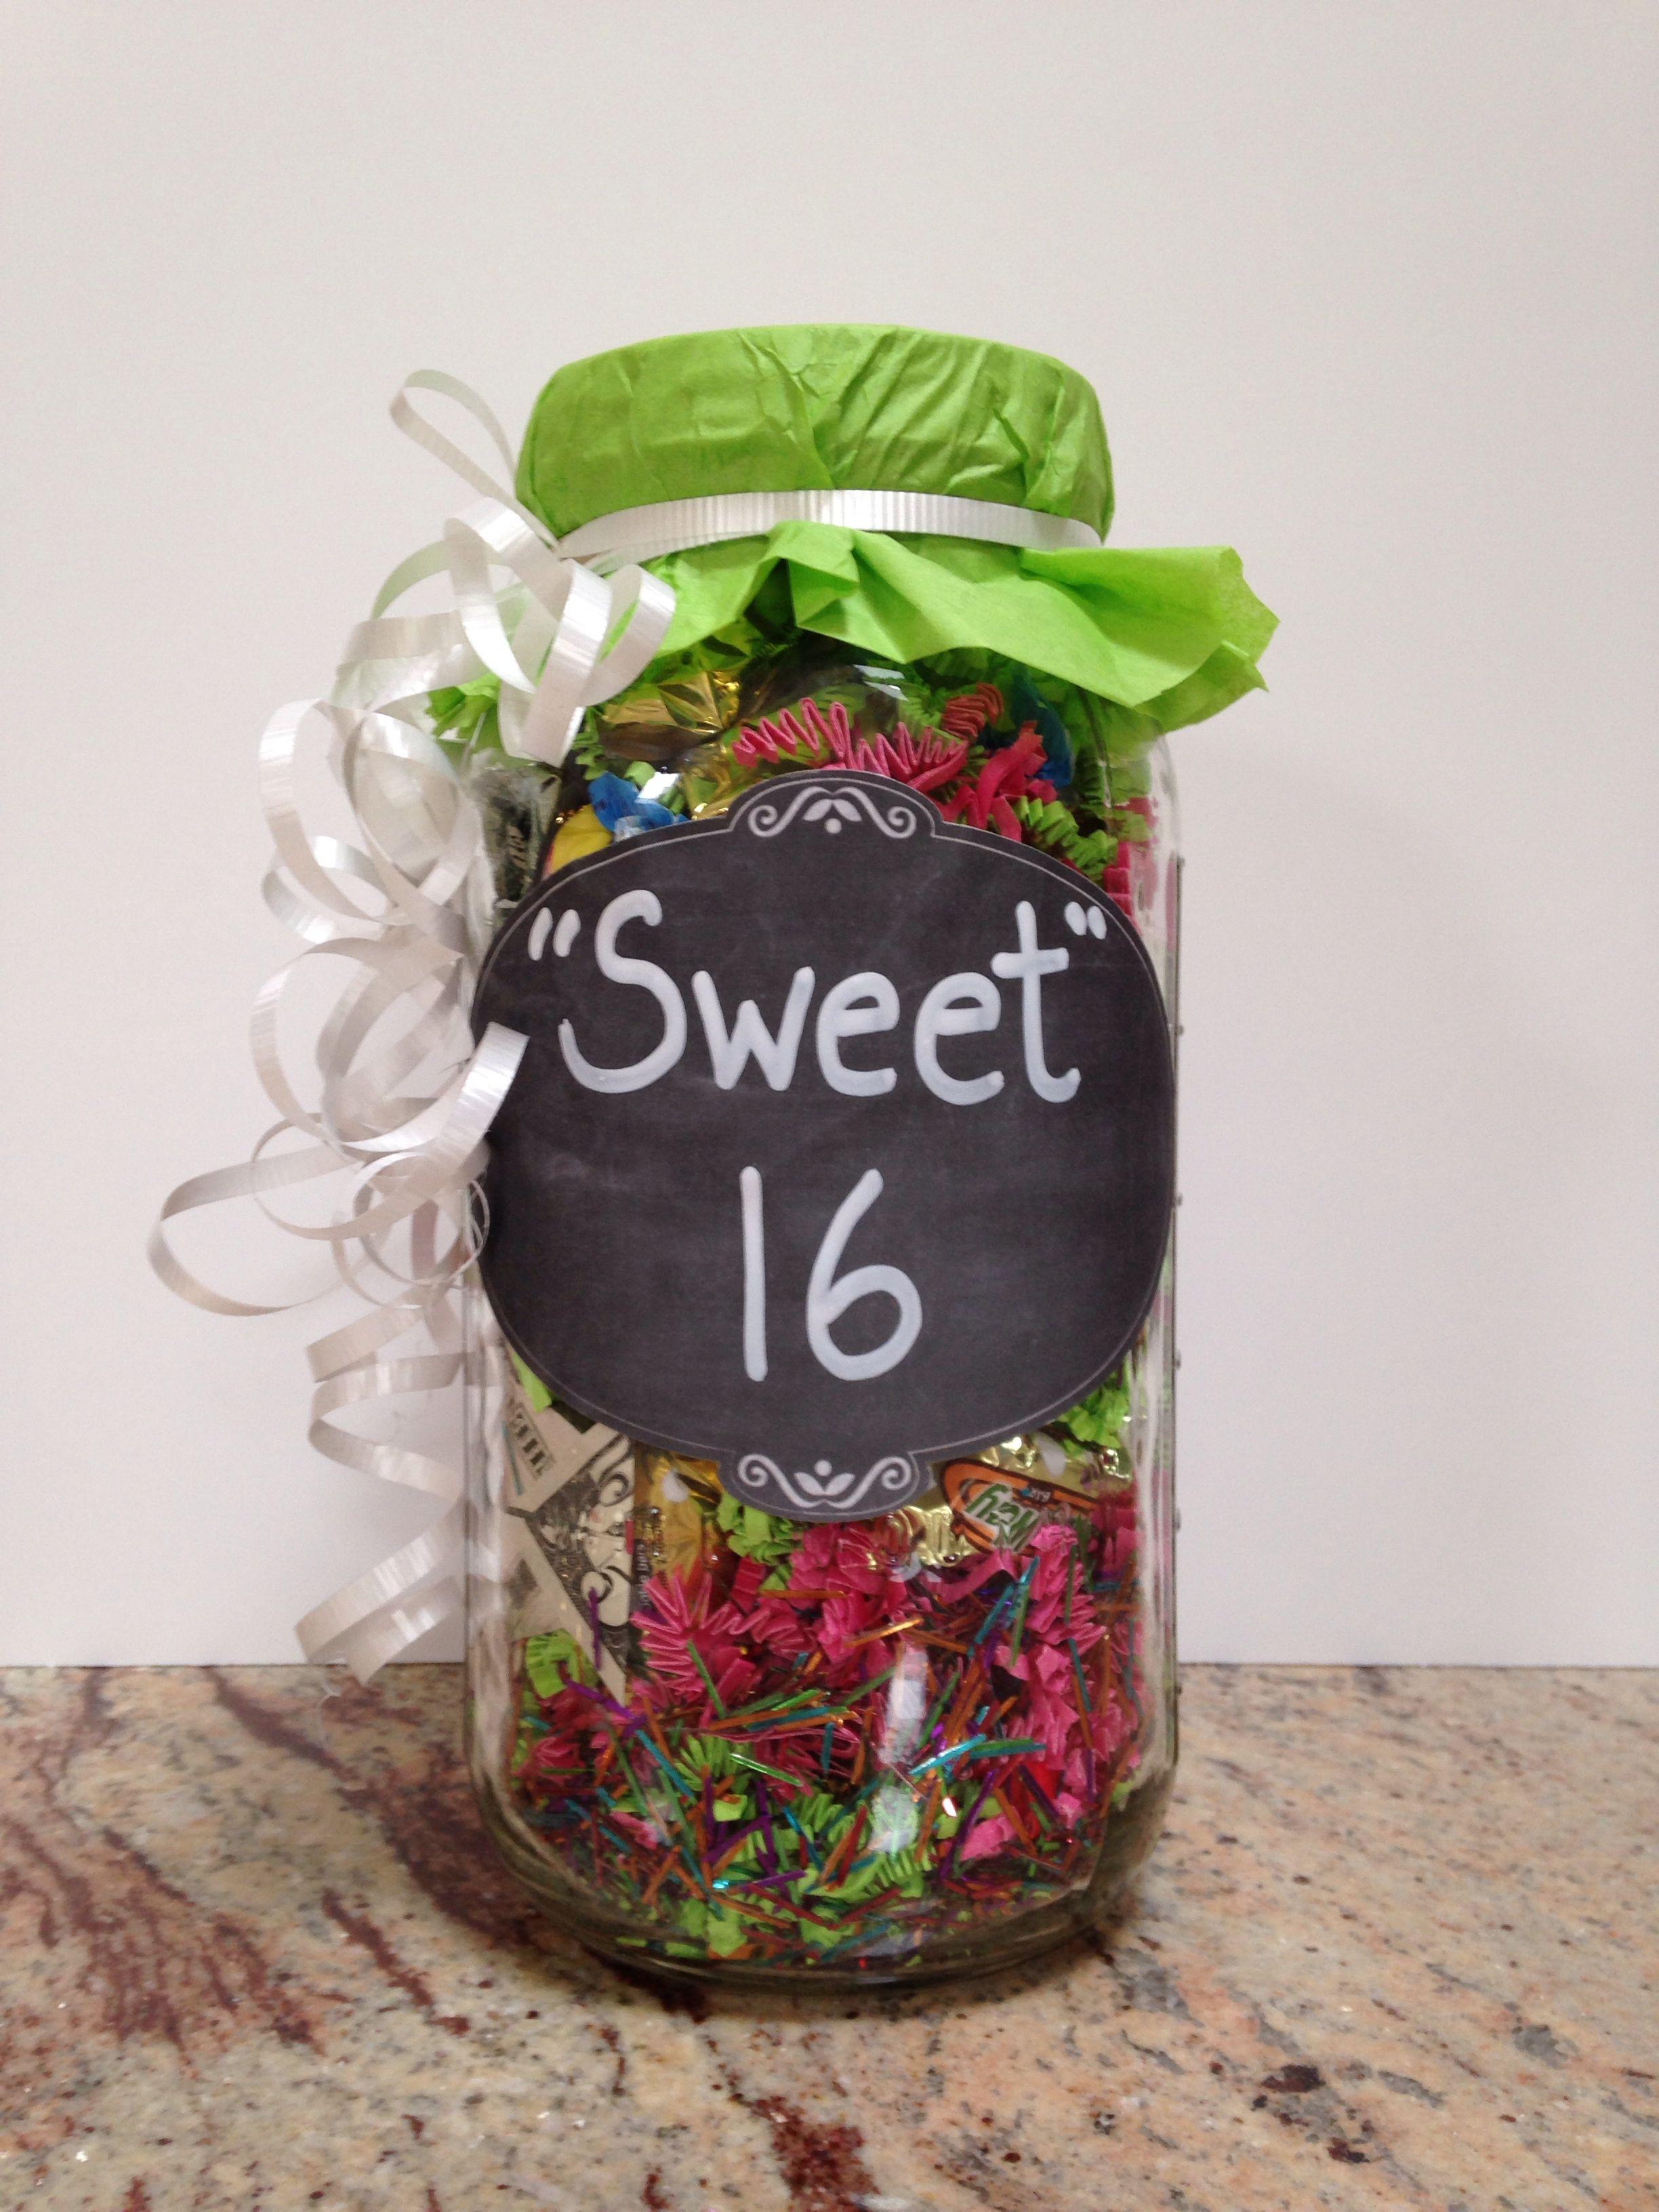 Diy sweet 16 gift sweet 16 gifts gifts money gift